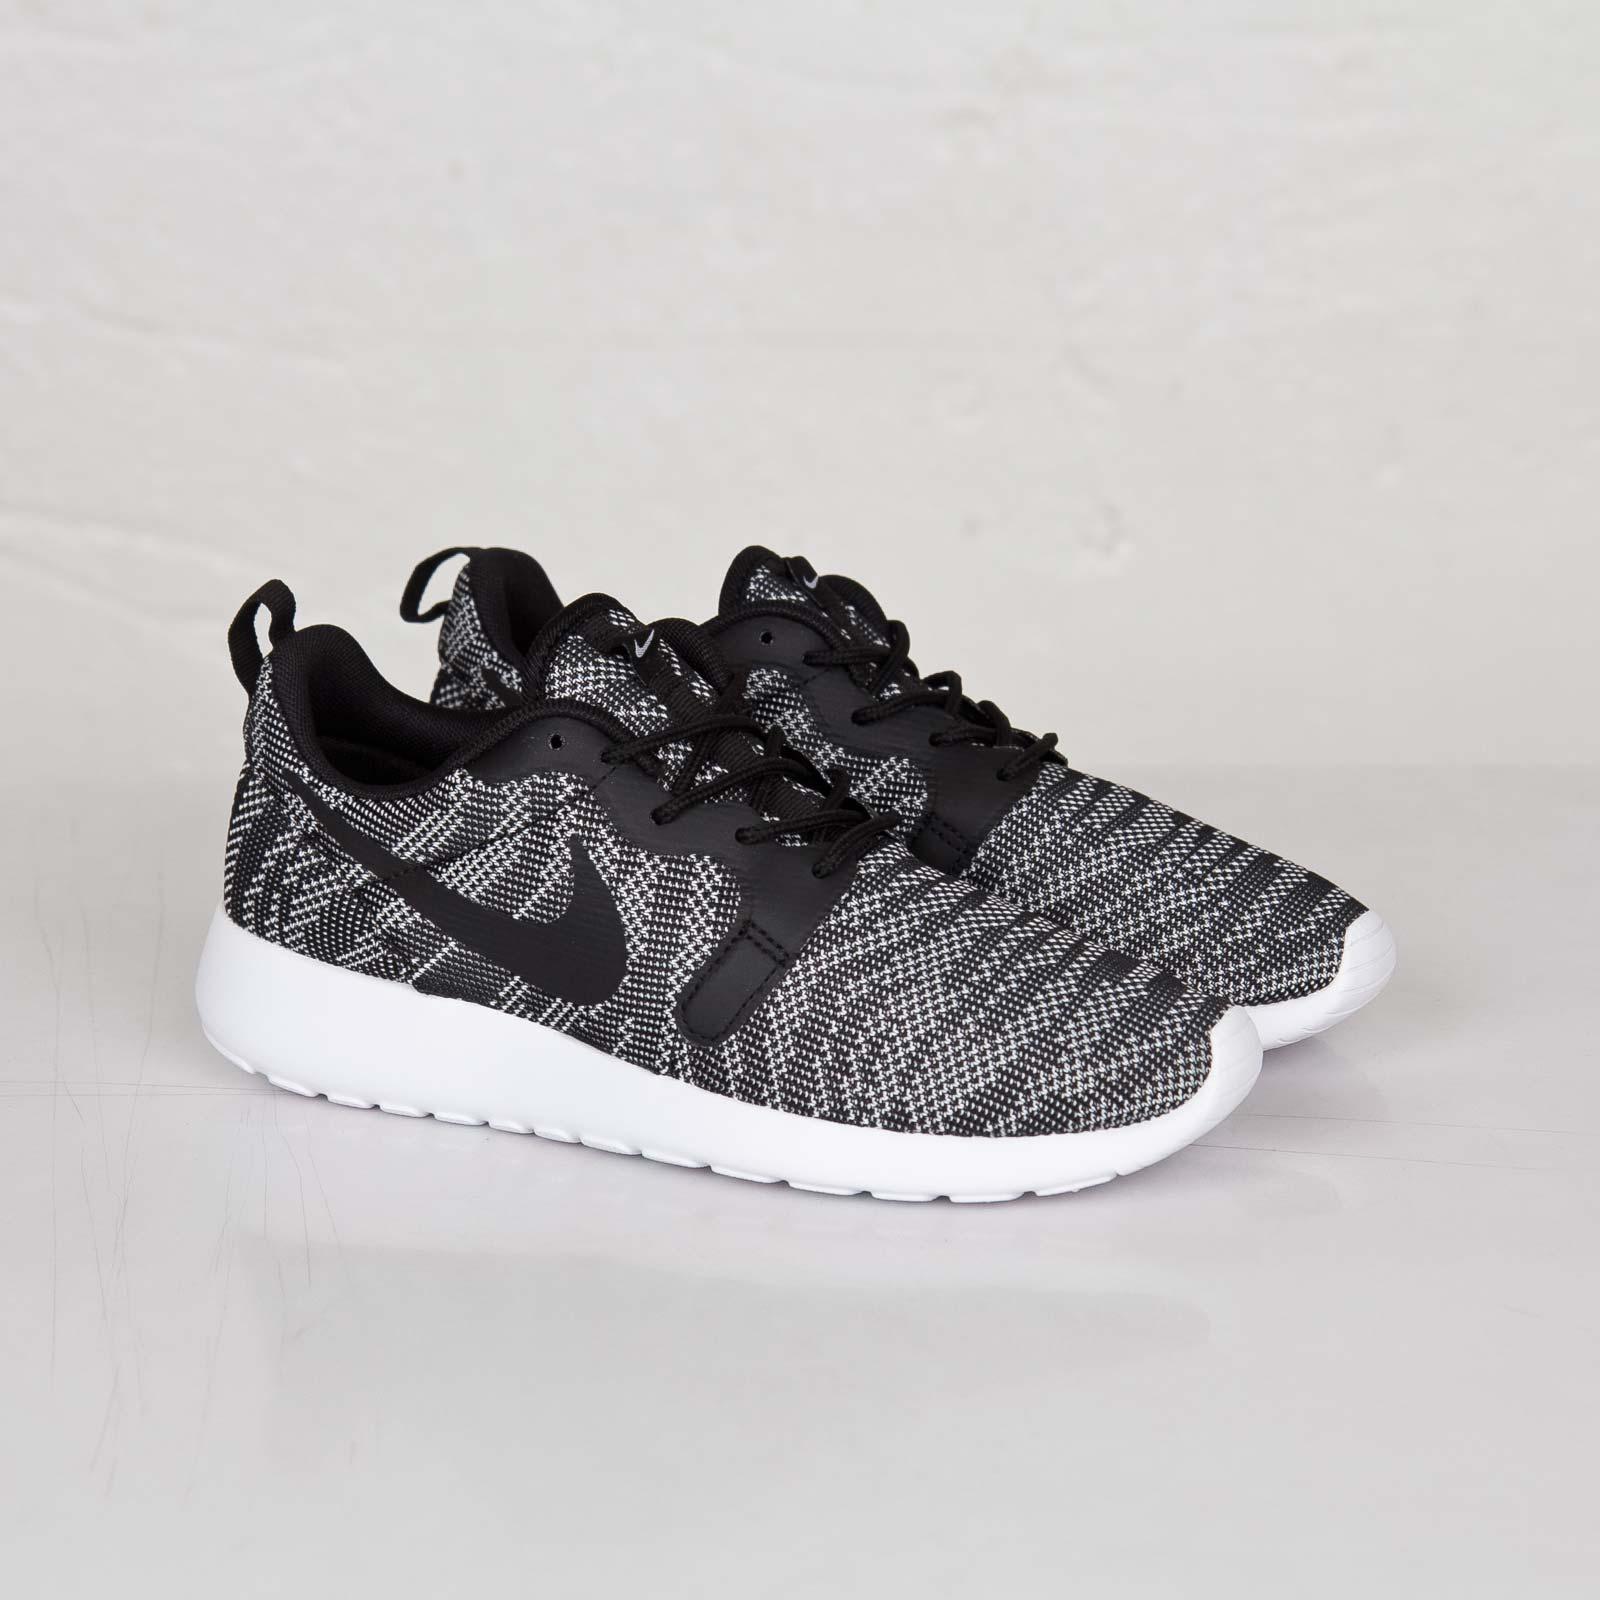 medios de comunicación cerveza negra Gaviota  Nike Roshe Run Knit Jaqcuard - 705217-100 - Sneakersnstuff | sneakers &  streetwear online since 1999